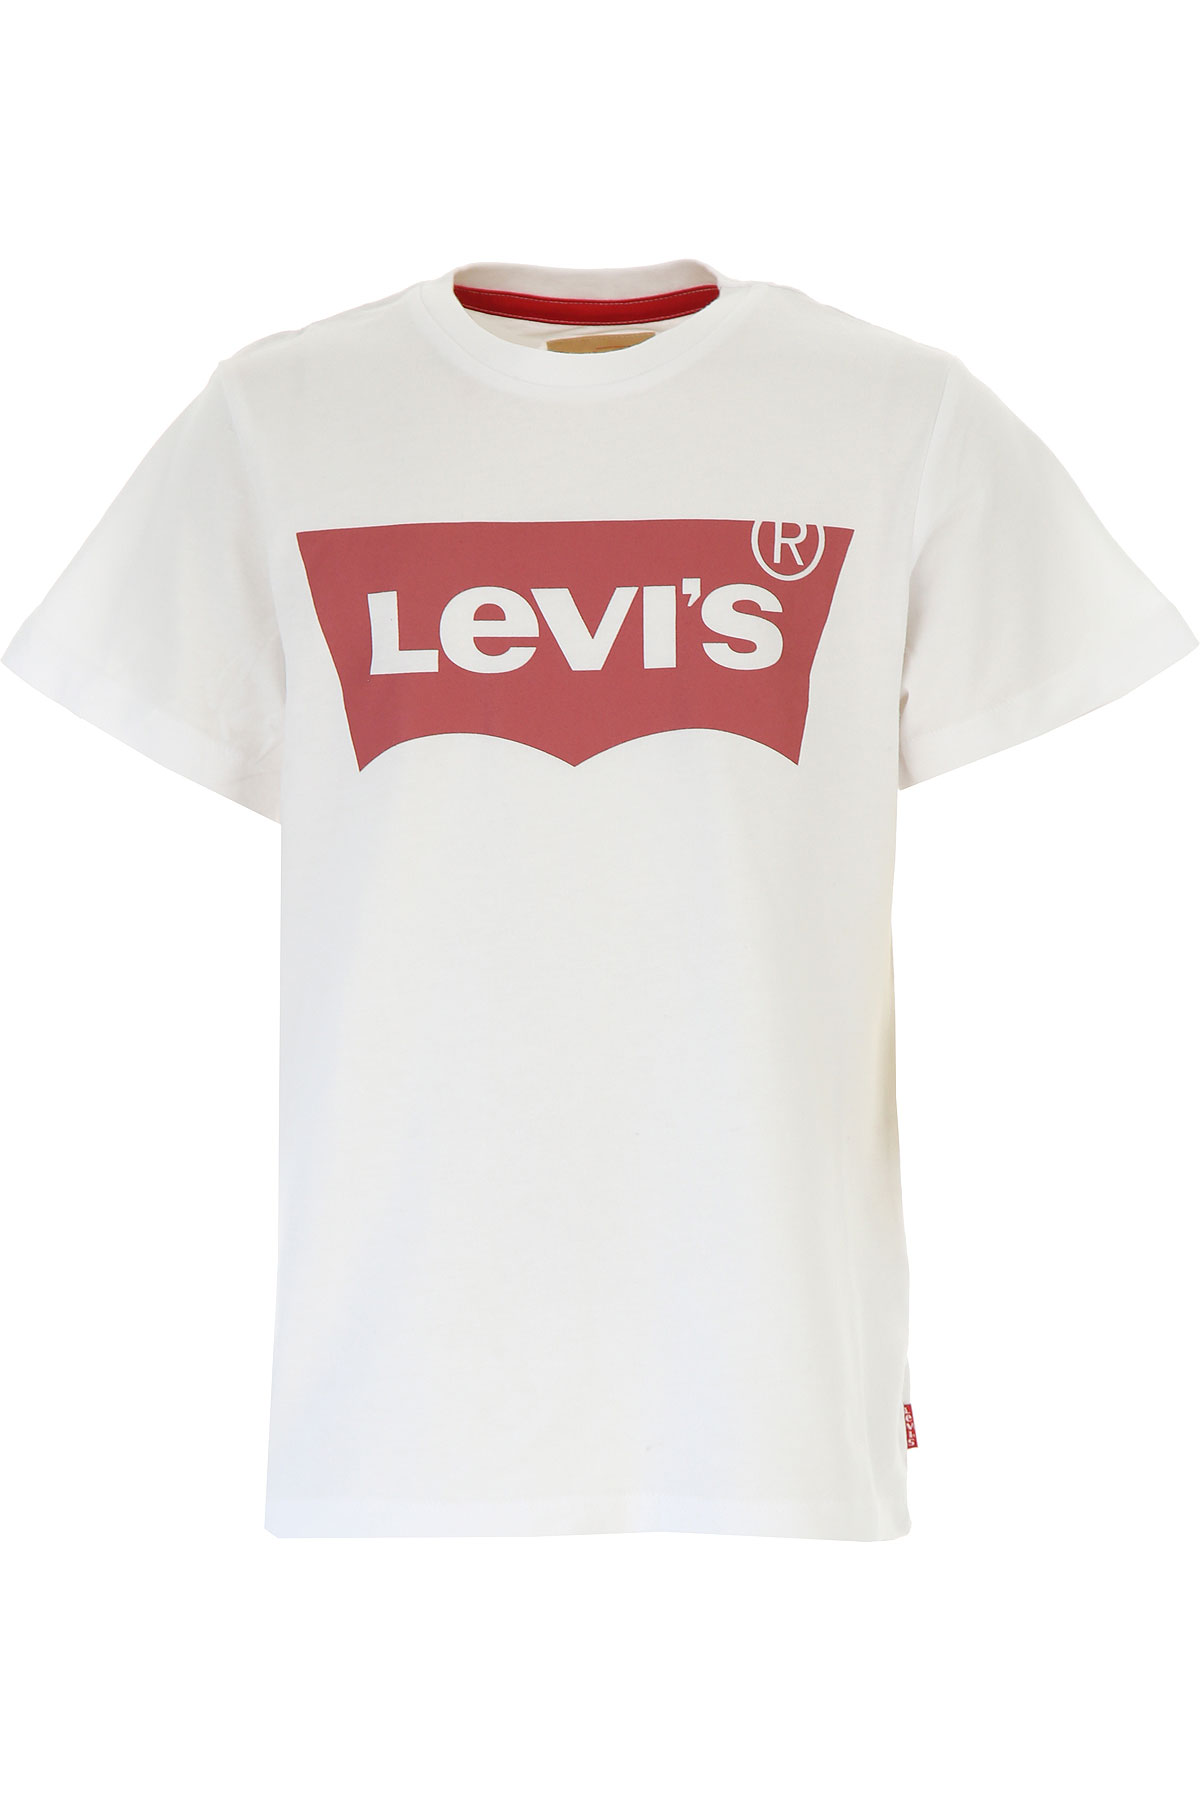 Levis Kids T-Shirt for Boys On Sale, White, Cotton, 2019, 14Y 16Y 4Y 8Y